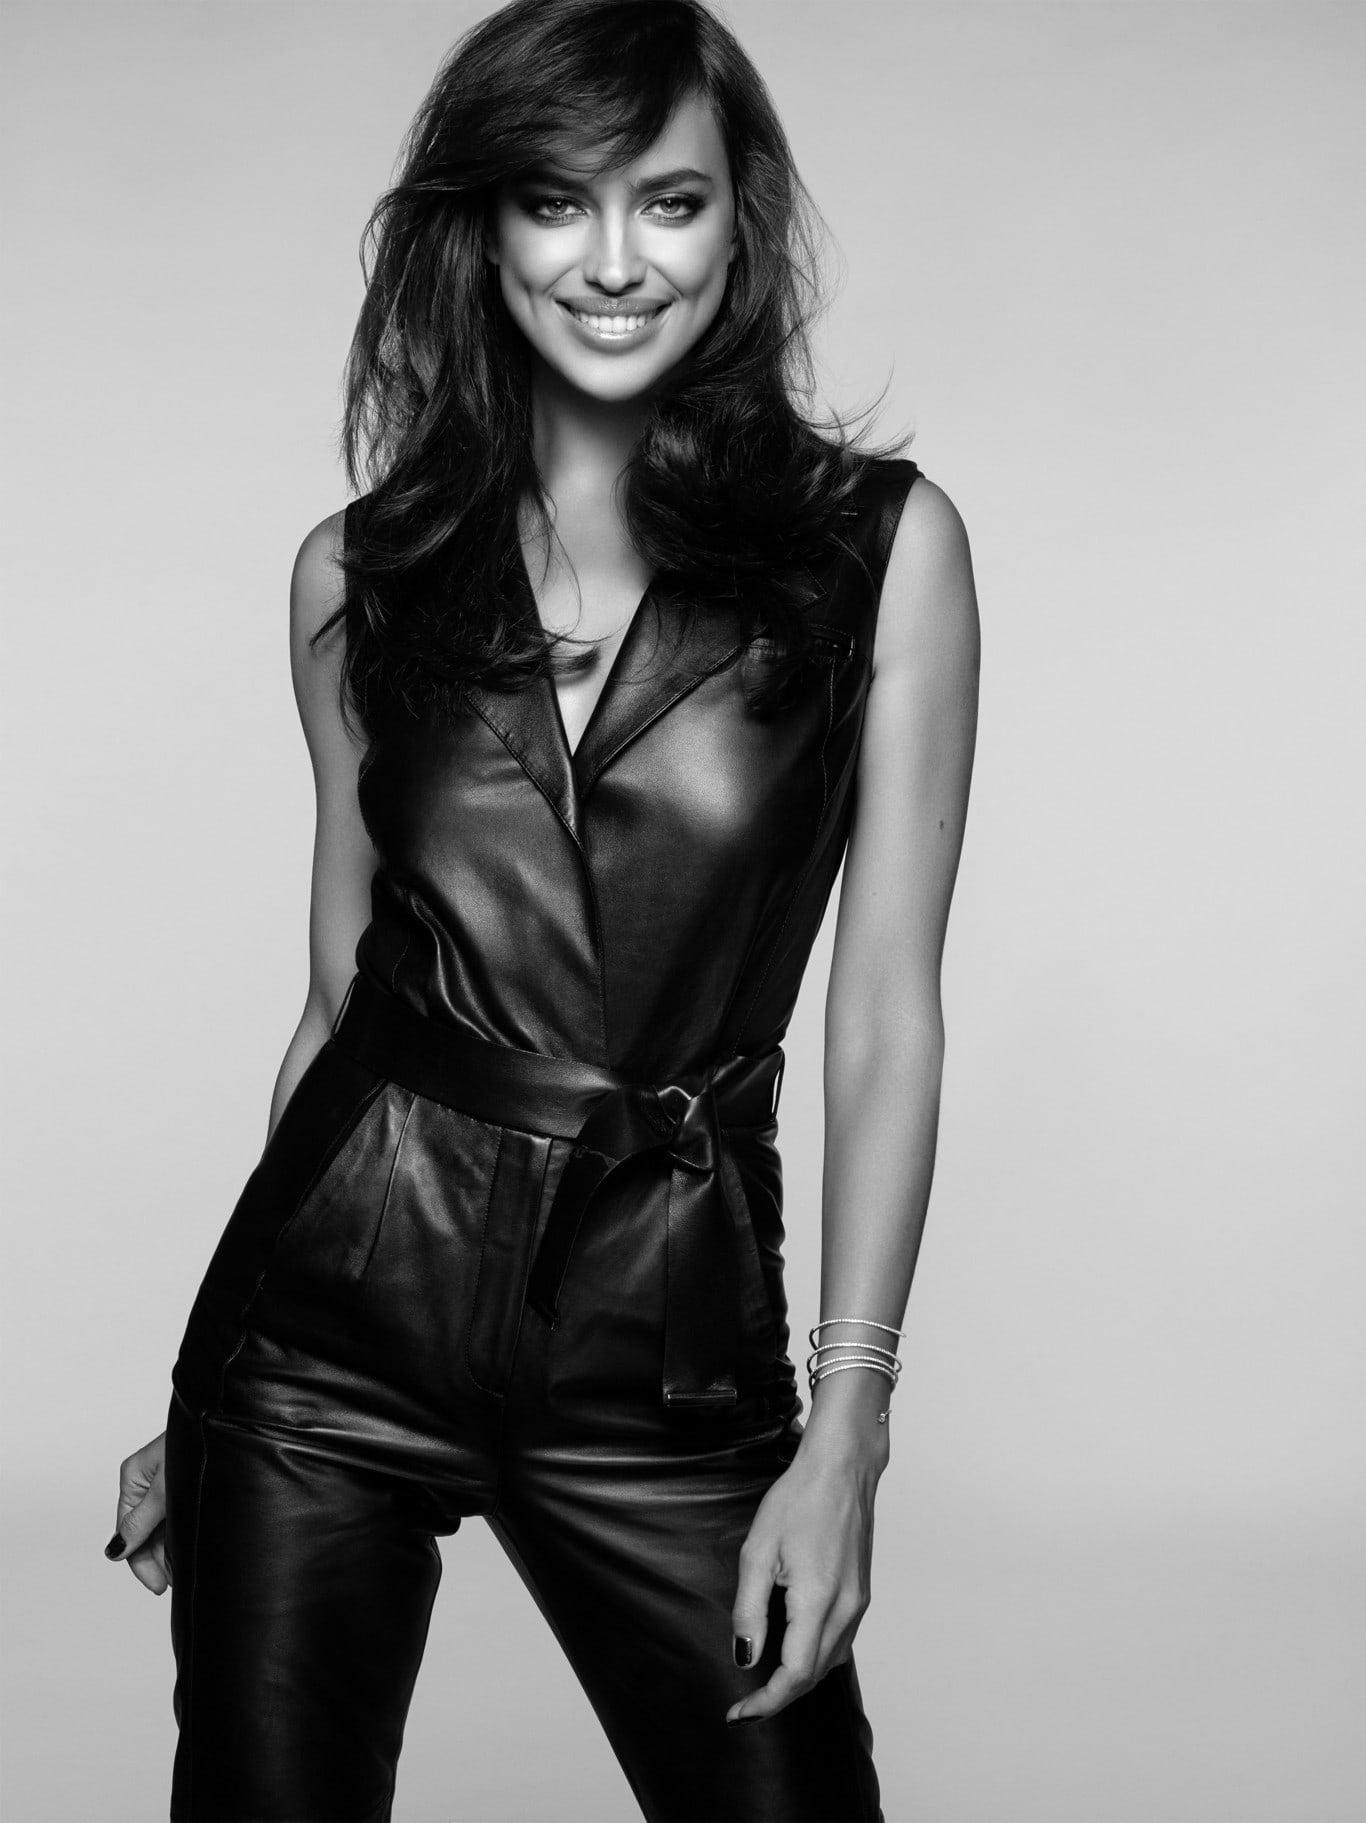 Irina Shayk nueva embajadora de L'Oréal Paris